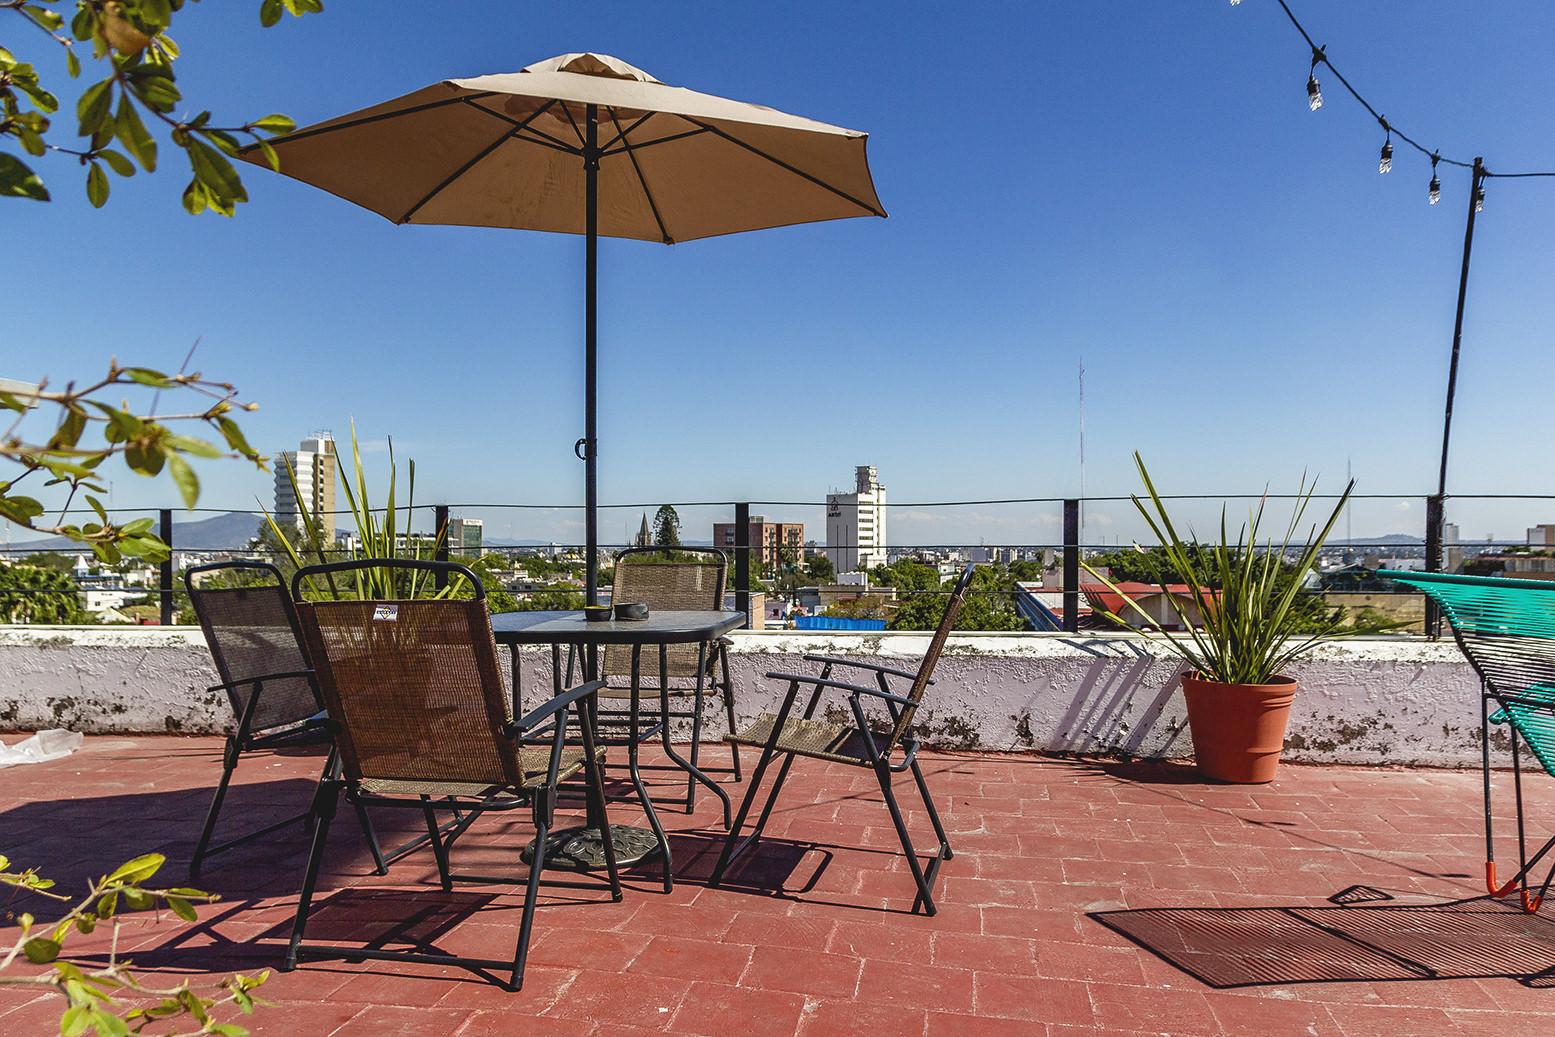 Casa Xalisco – Rooftop Chapultepec